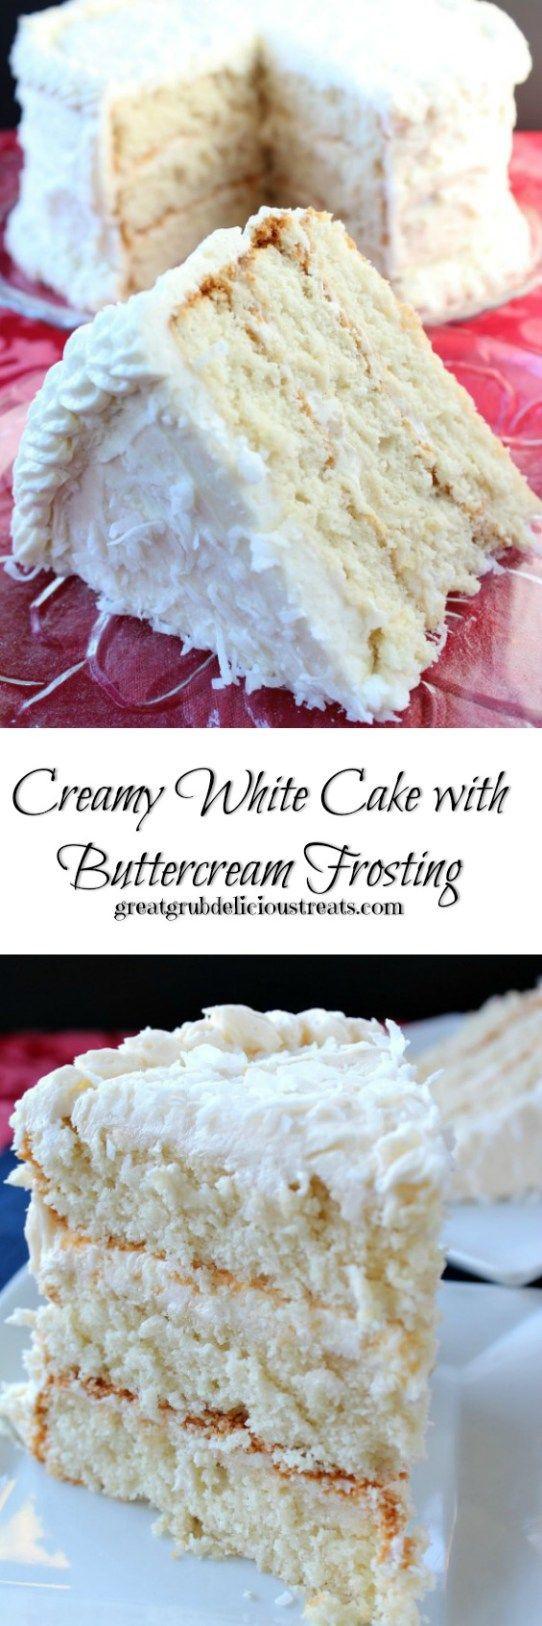 White Wedding Cake Frosting Recipes  25 best ideas about White cake mixes on Pinterest